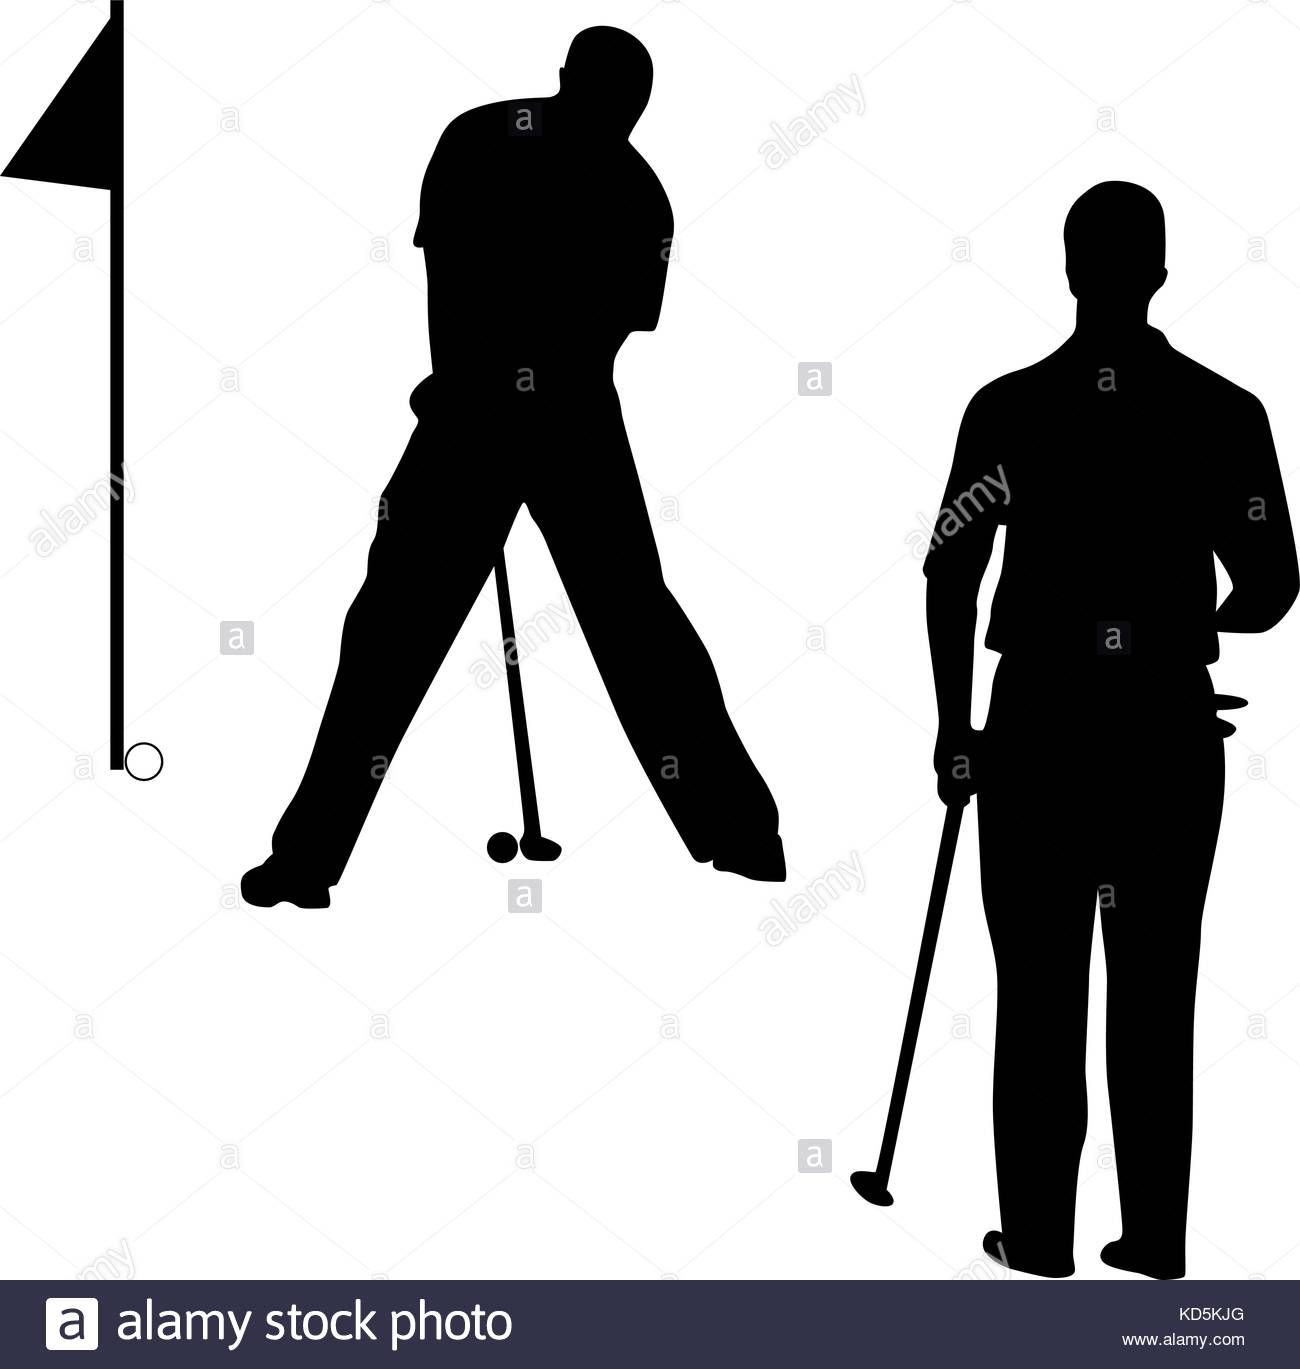 1300x1369 Golfball Tee Silhouette Stock Photos Amp Golfball Tee Silhouette